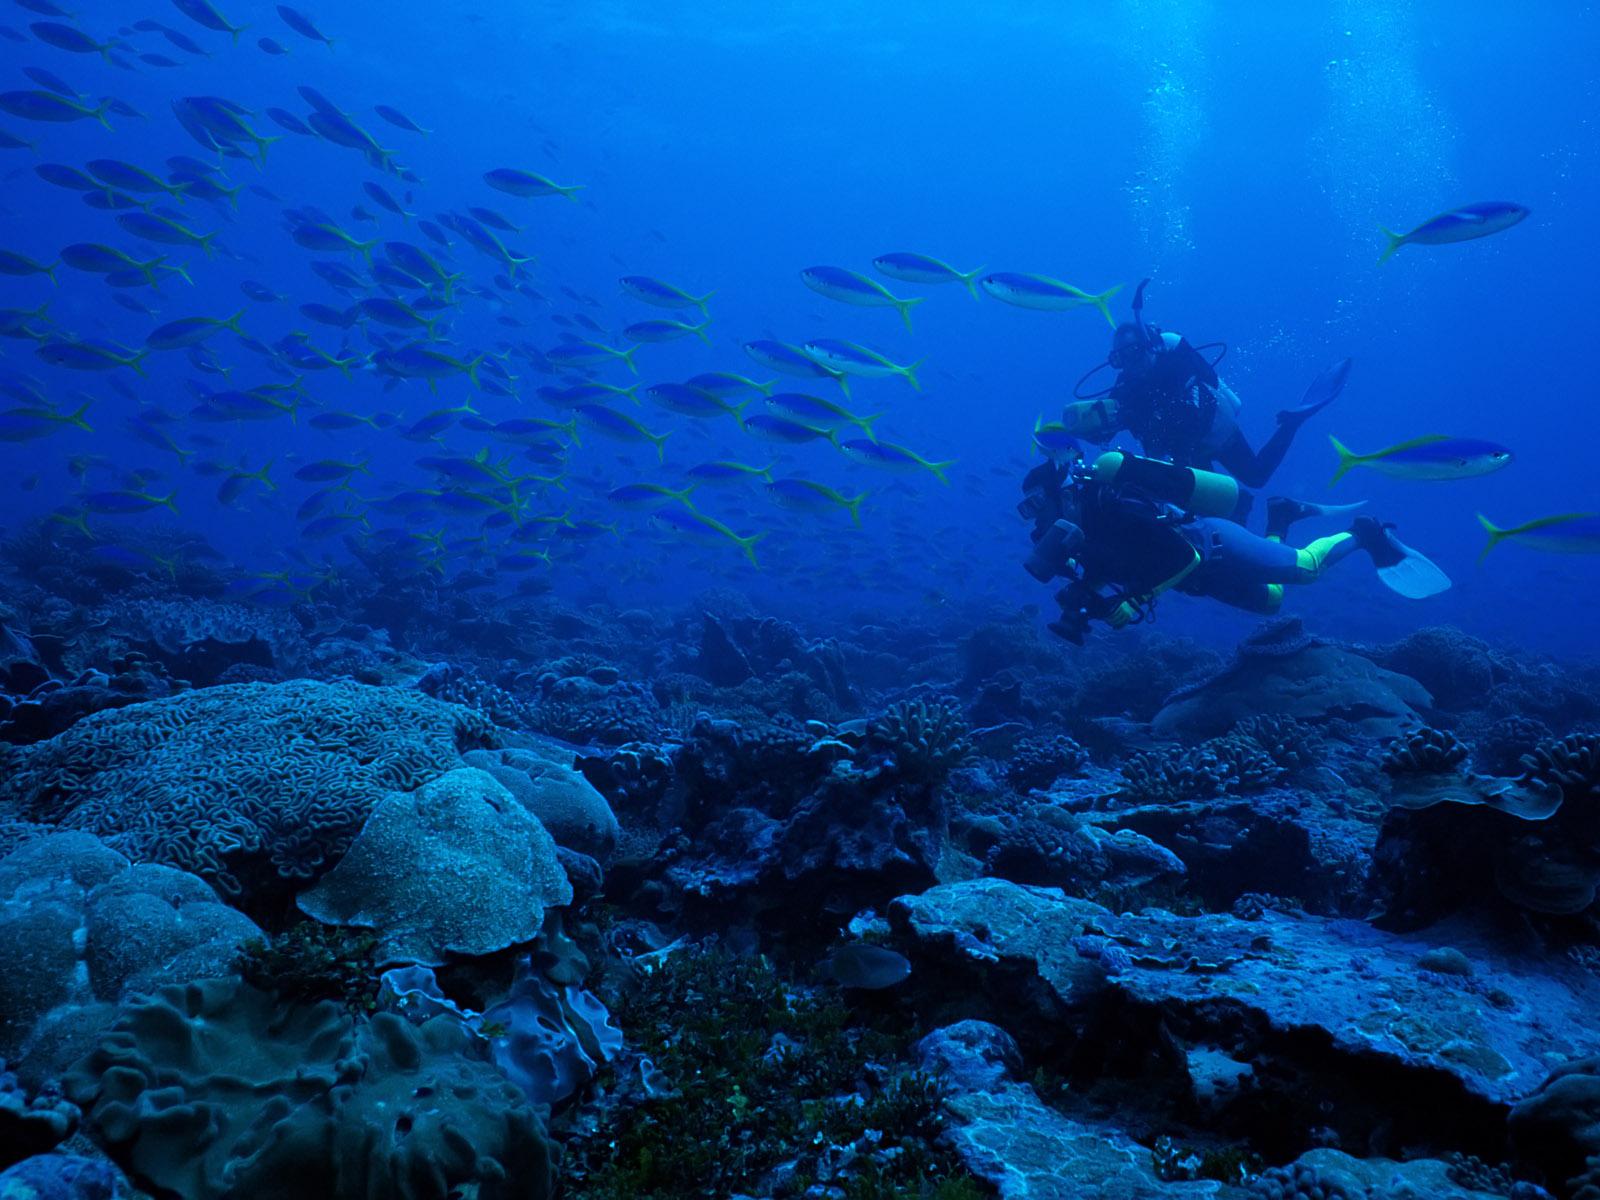 Underwater Wallpapers High Definition - WallpaperSafari